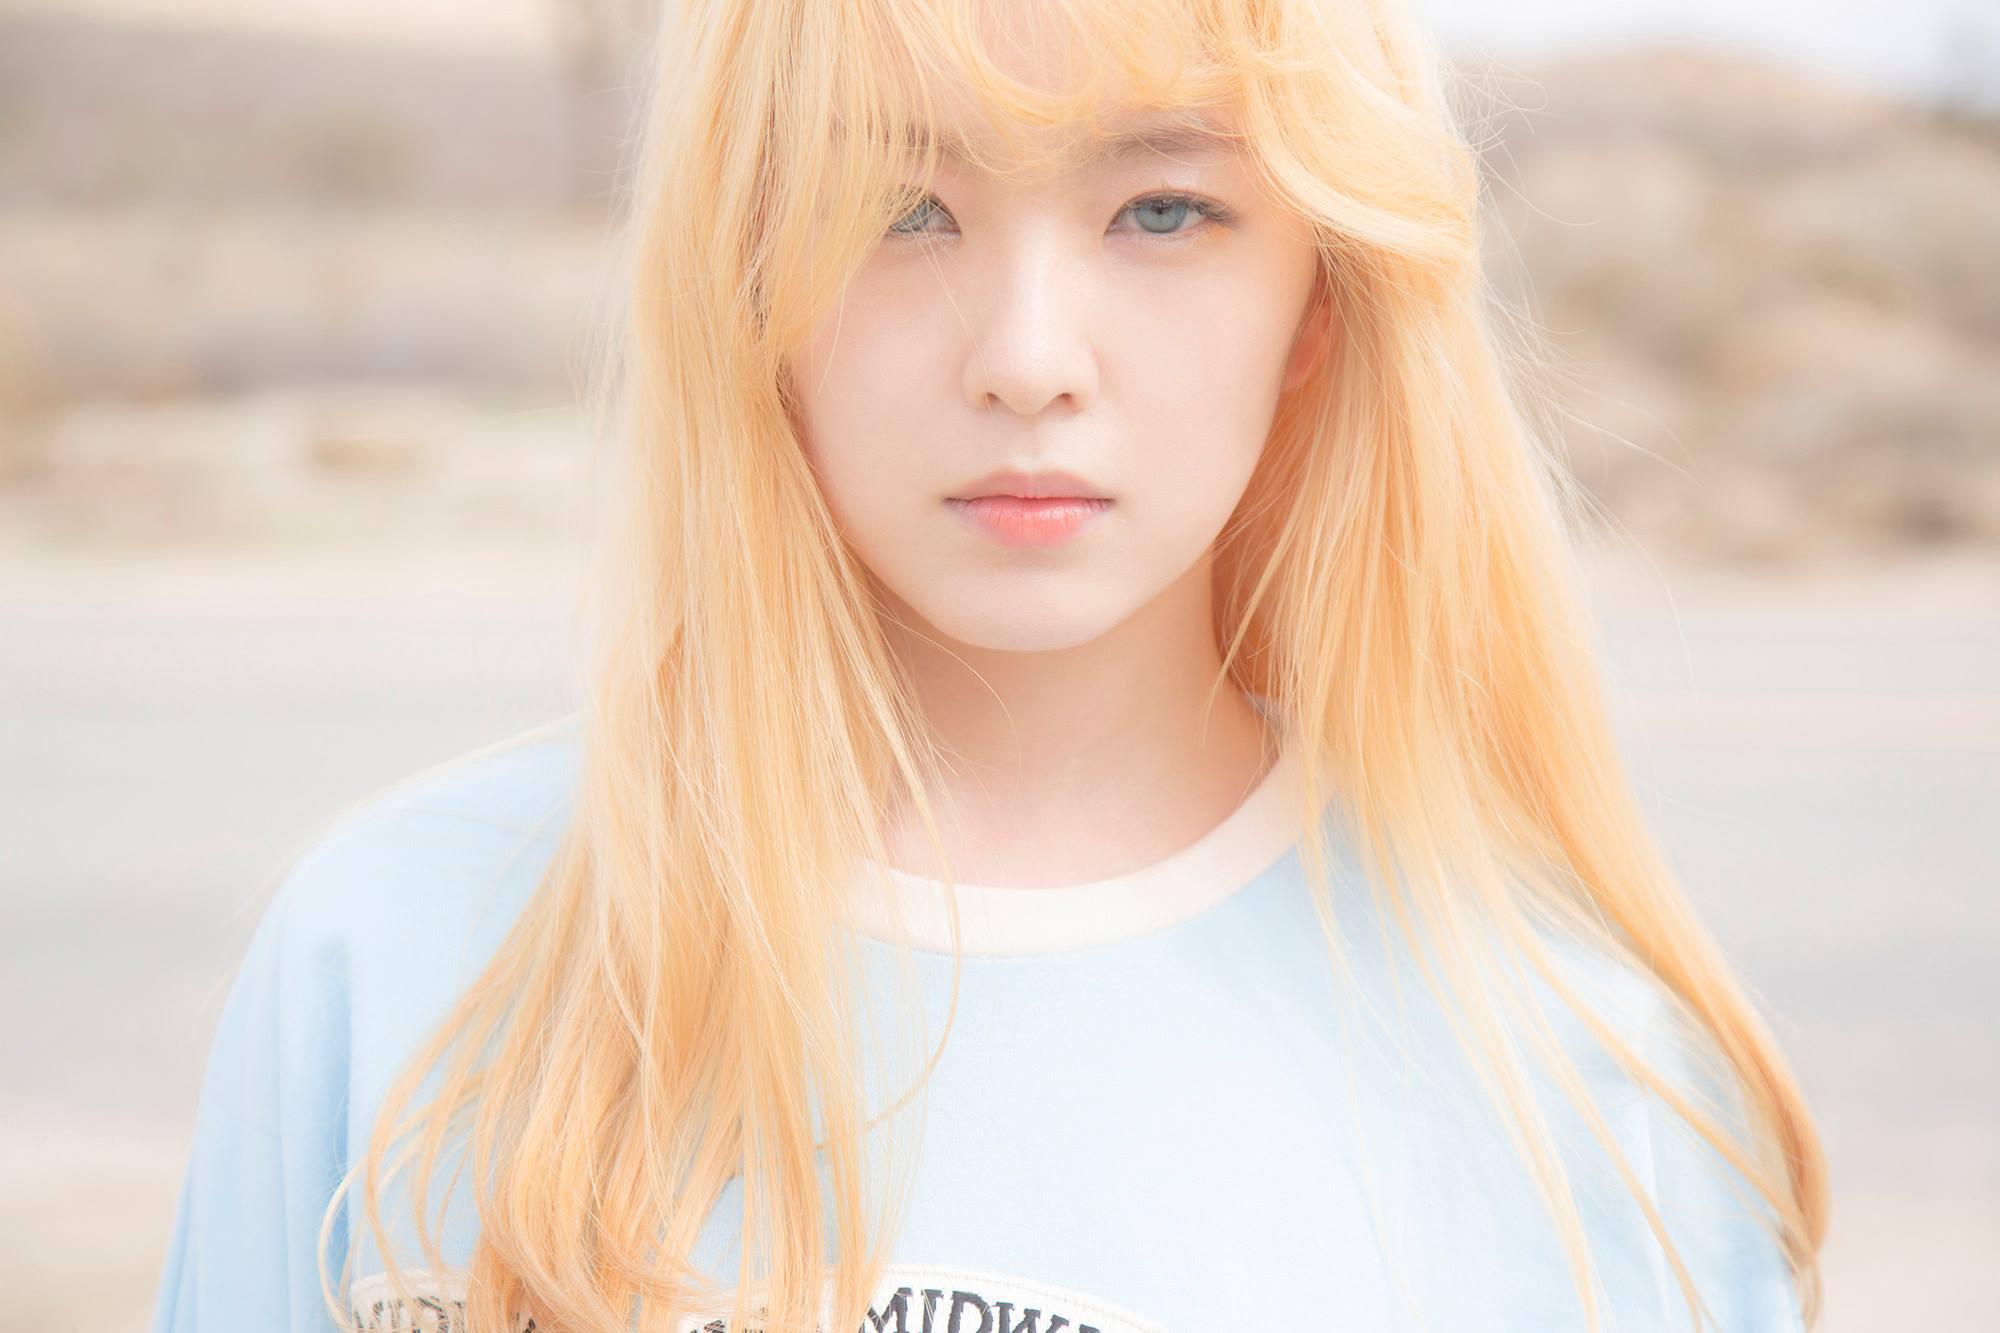 Image: SMTOWN / Red Velvet's Facebook